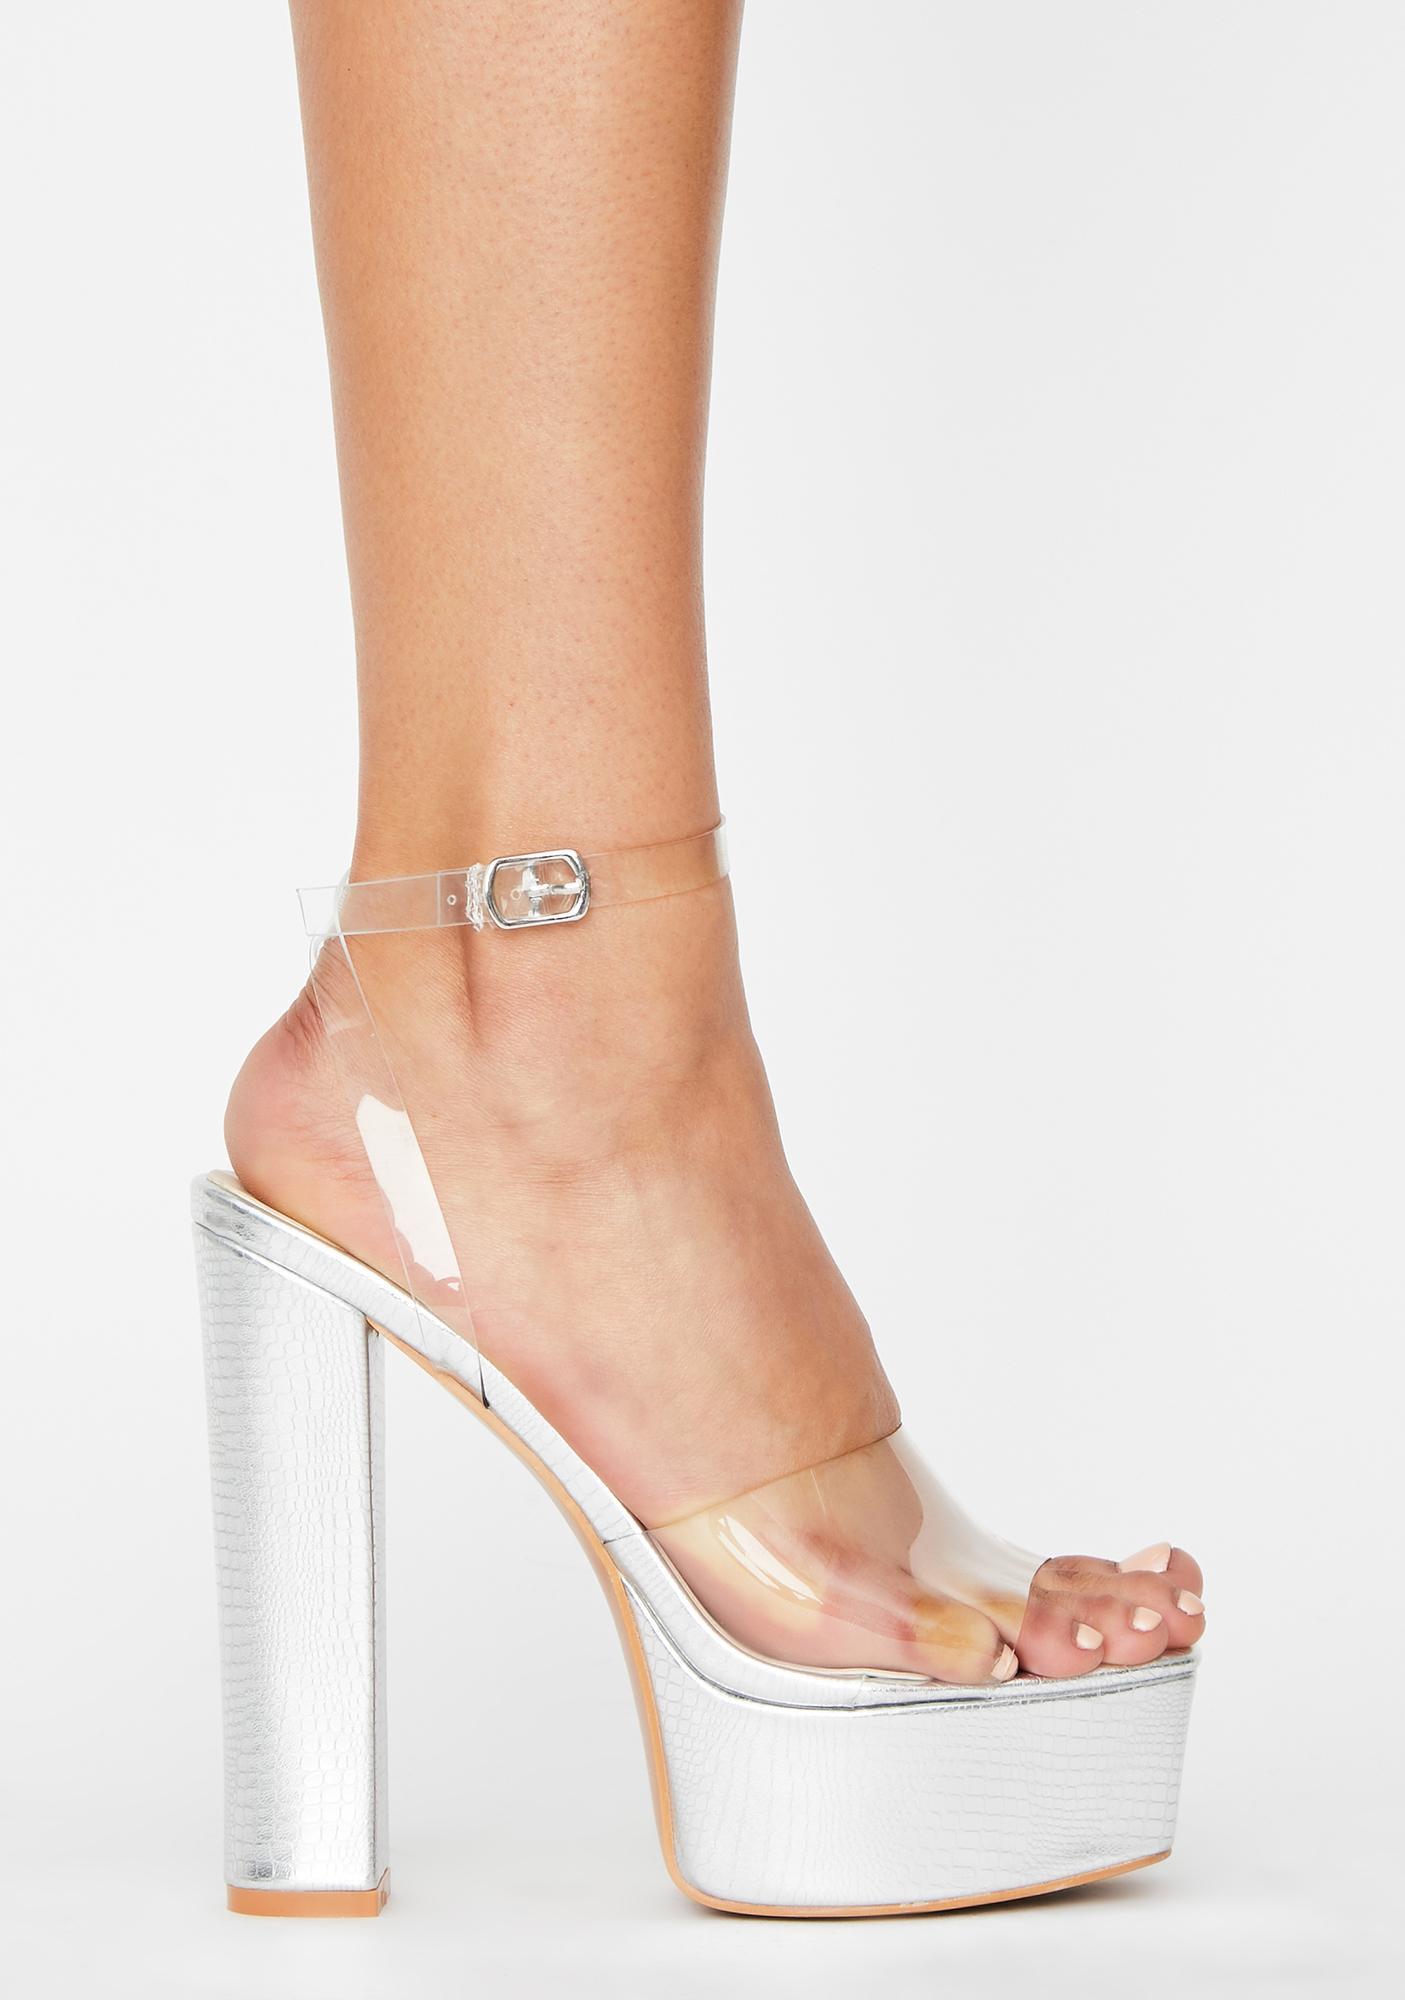 Diva Get It Done Platform Heels